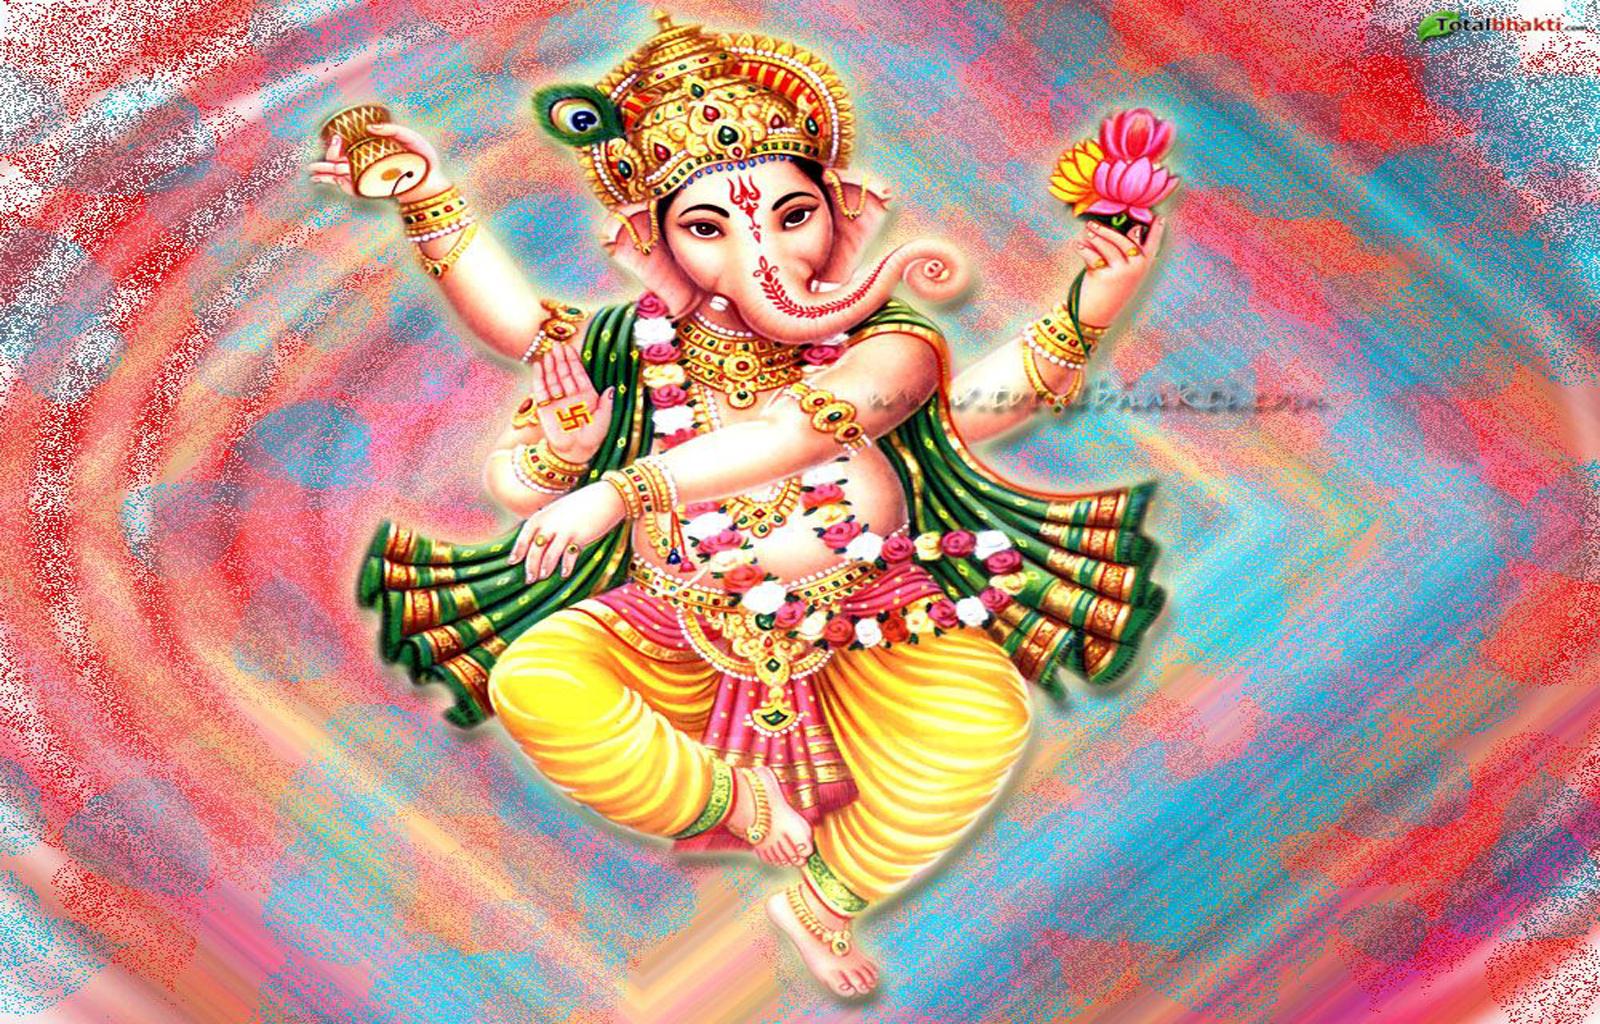 http://1.bp.blogspot.com/-jp9yWPCR1Rw/Tzn5TwbzD_I/AAAAAAAACKc/2pp8th9czPg/s1600/beautiful-Ganesh-wallpaper.jpg